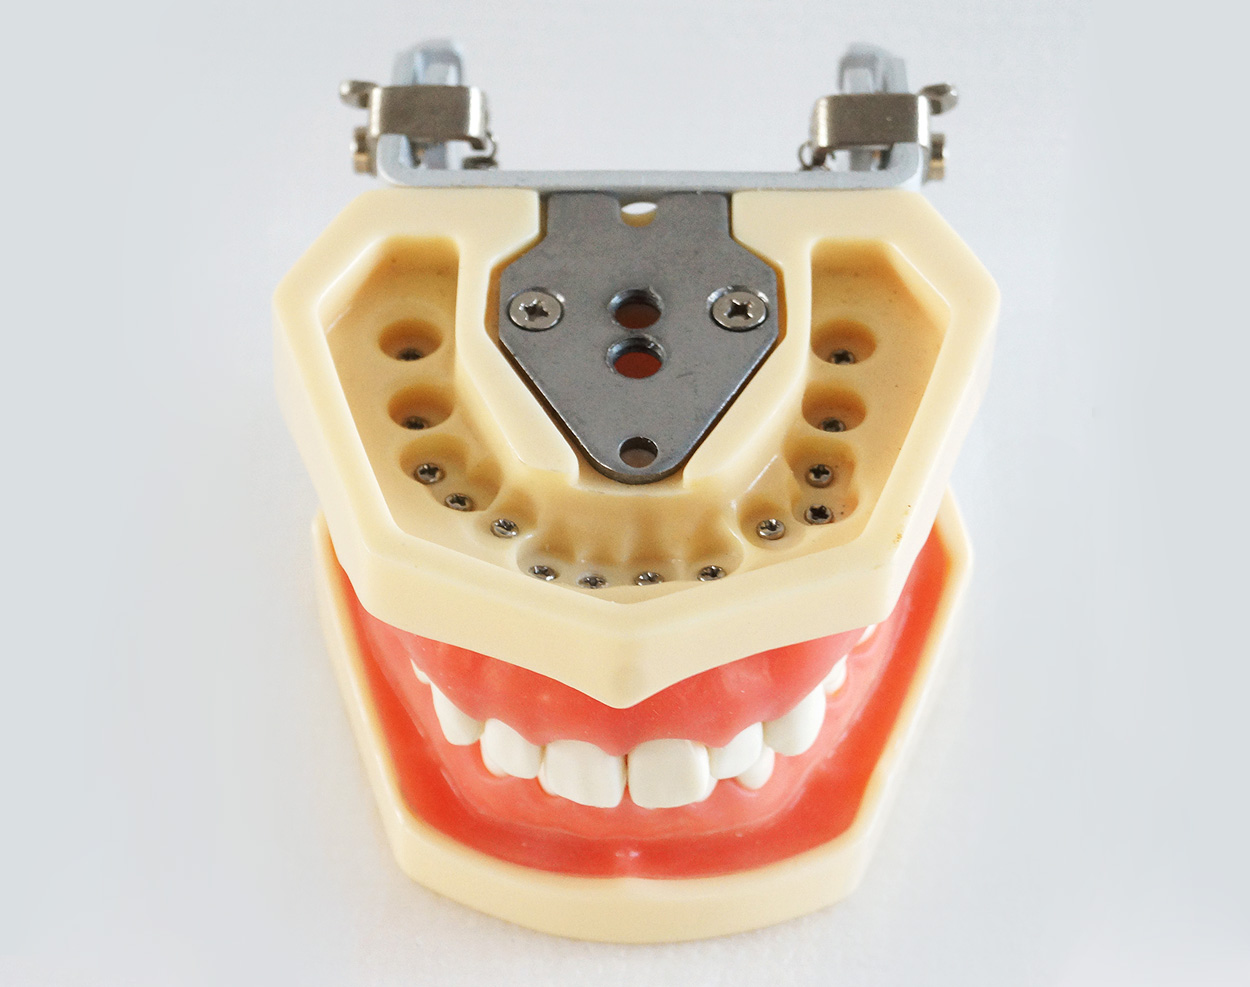 TM-A14 Dental Standard Teeth Model Study And Teach Model Soft Gum With Articulator SCREW FIX